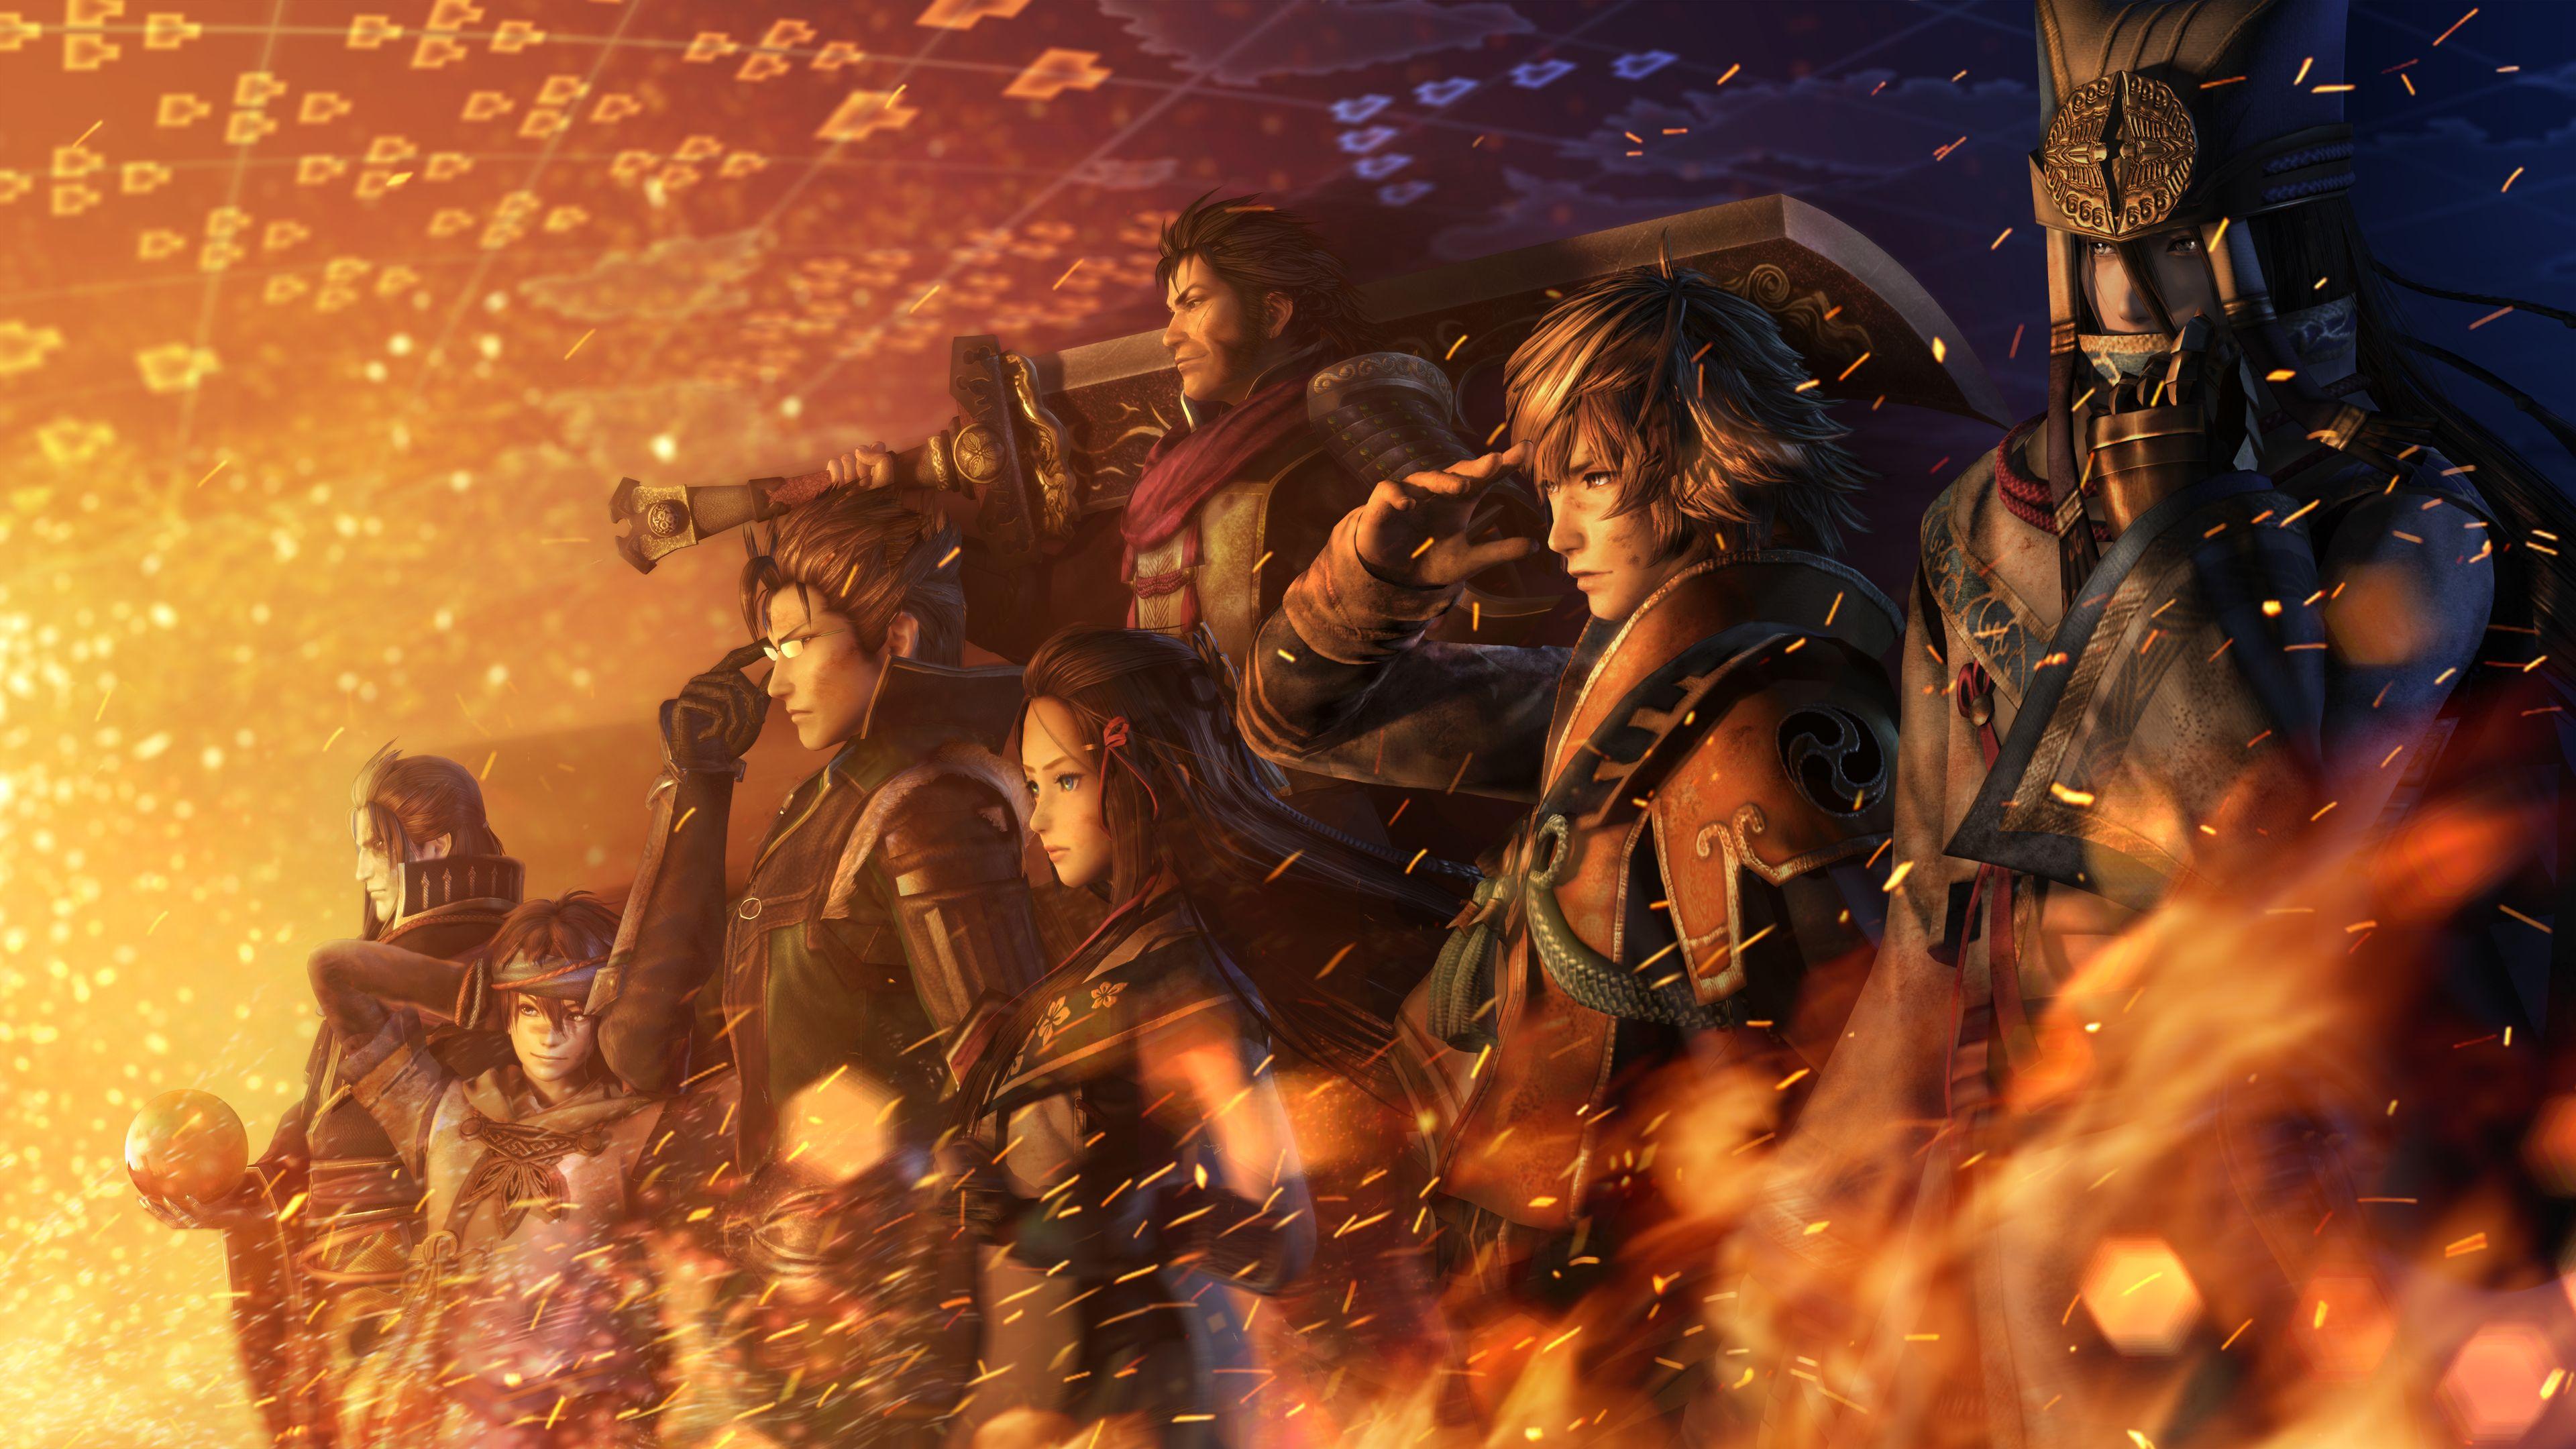 Samurai-Warriors-4-Empires_2015_09-17-15_013